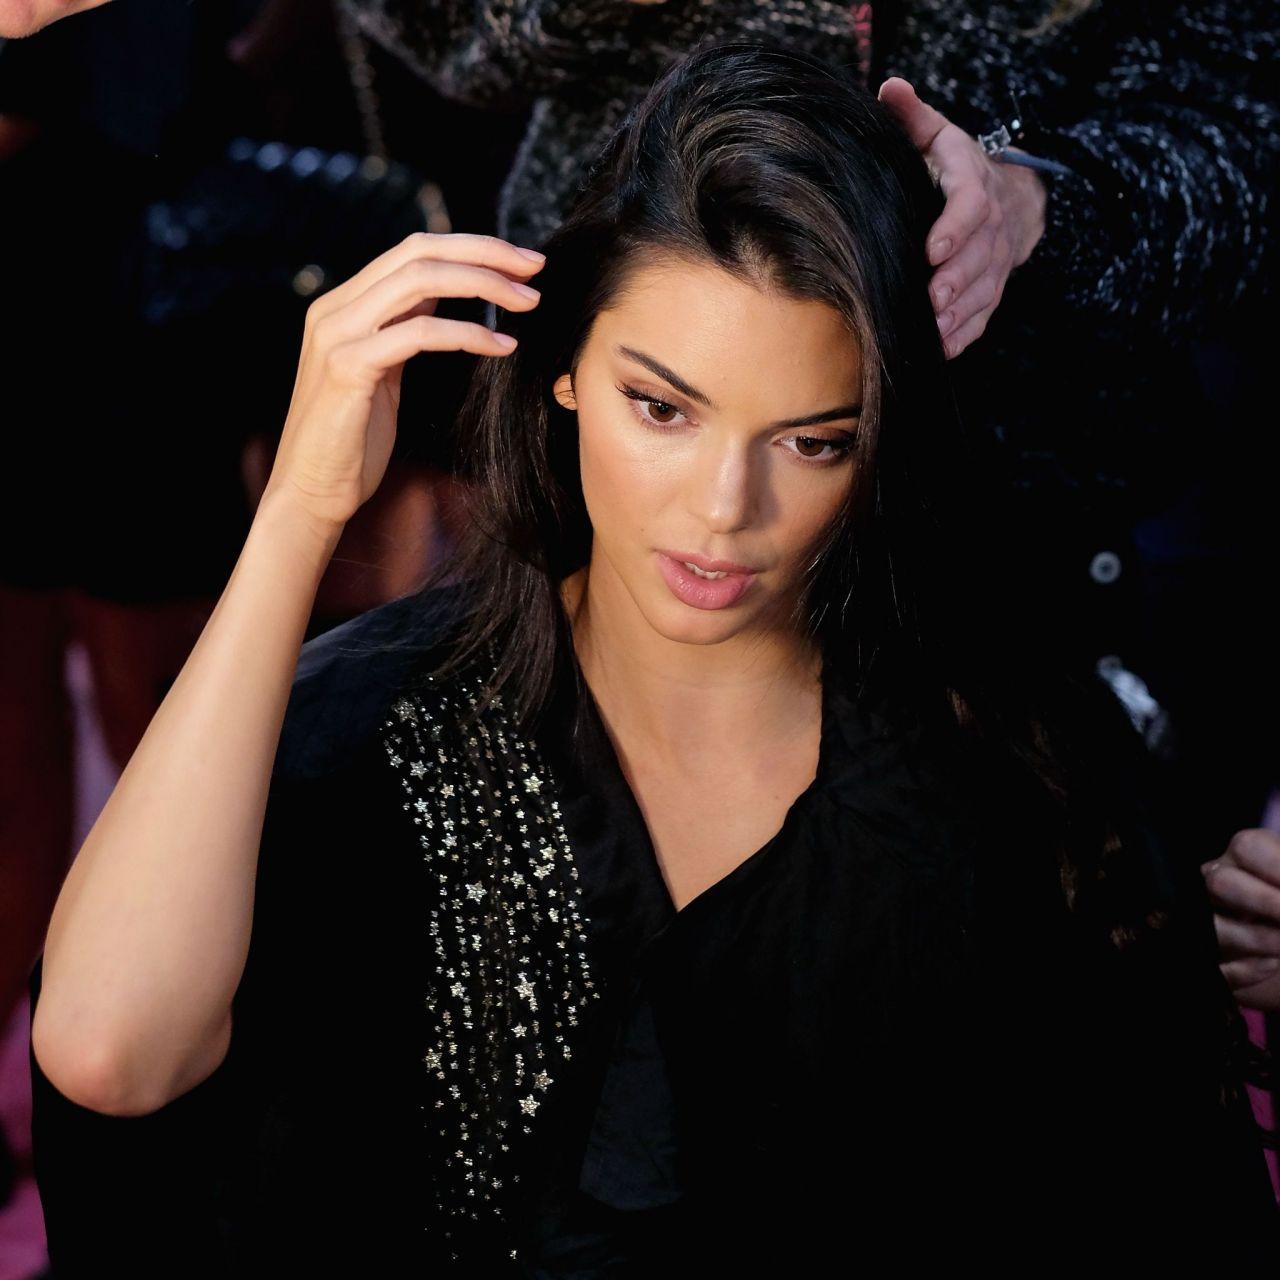 Kendall Jenner U2013 2018 Victoriau2019s Secret Fashion Show Backstage (Part II)